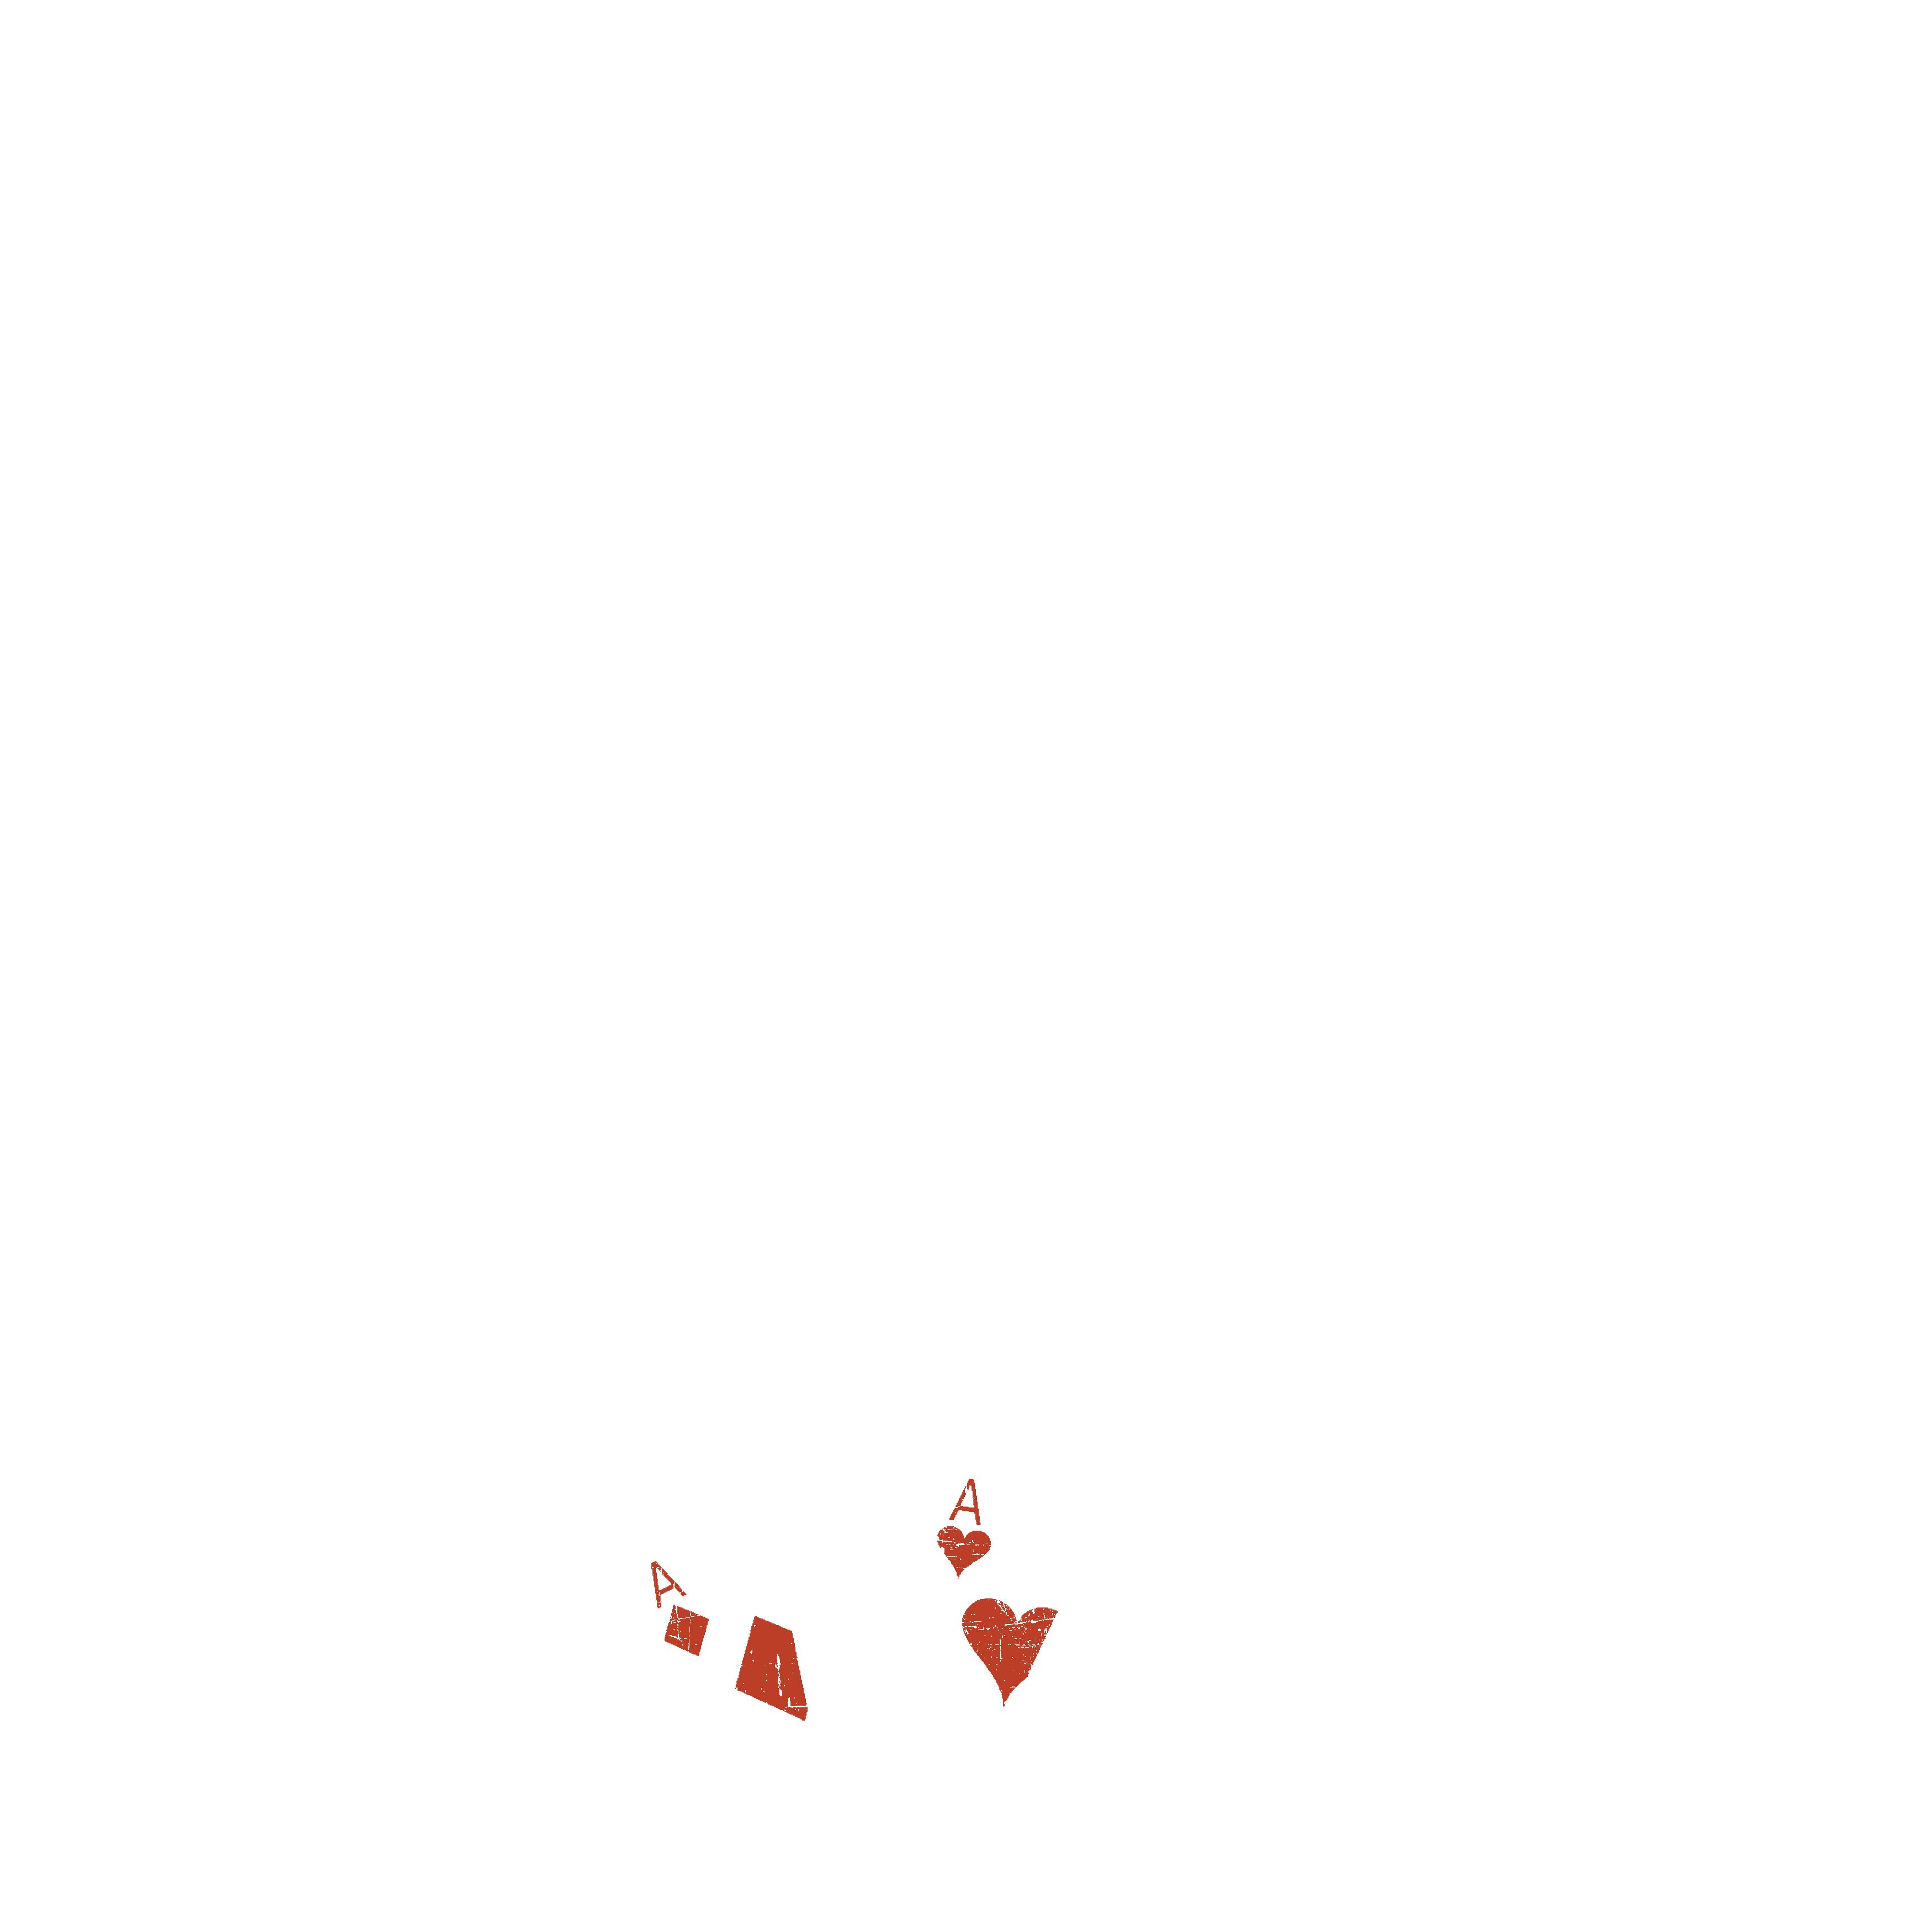 2017 MPB Commodities Annapolis Poker Run T-Shirt